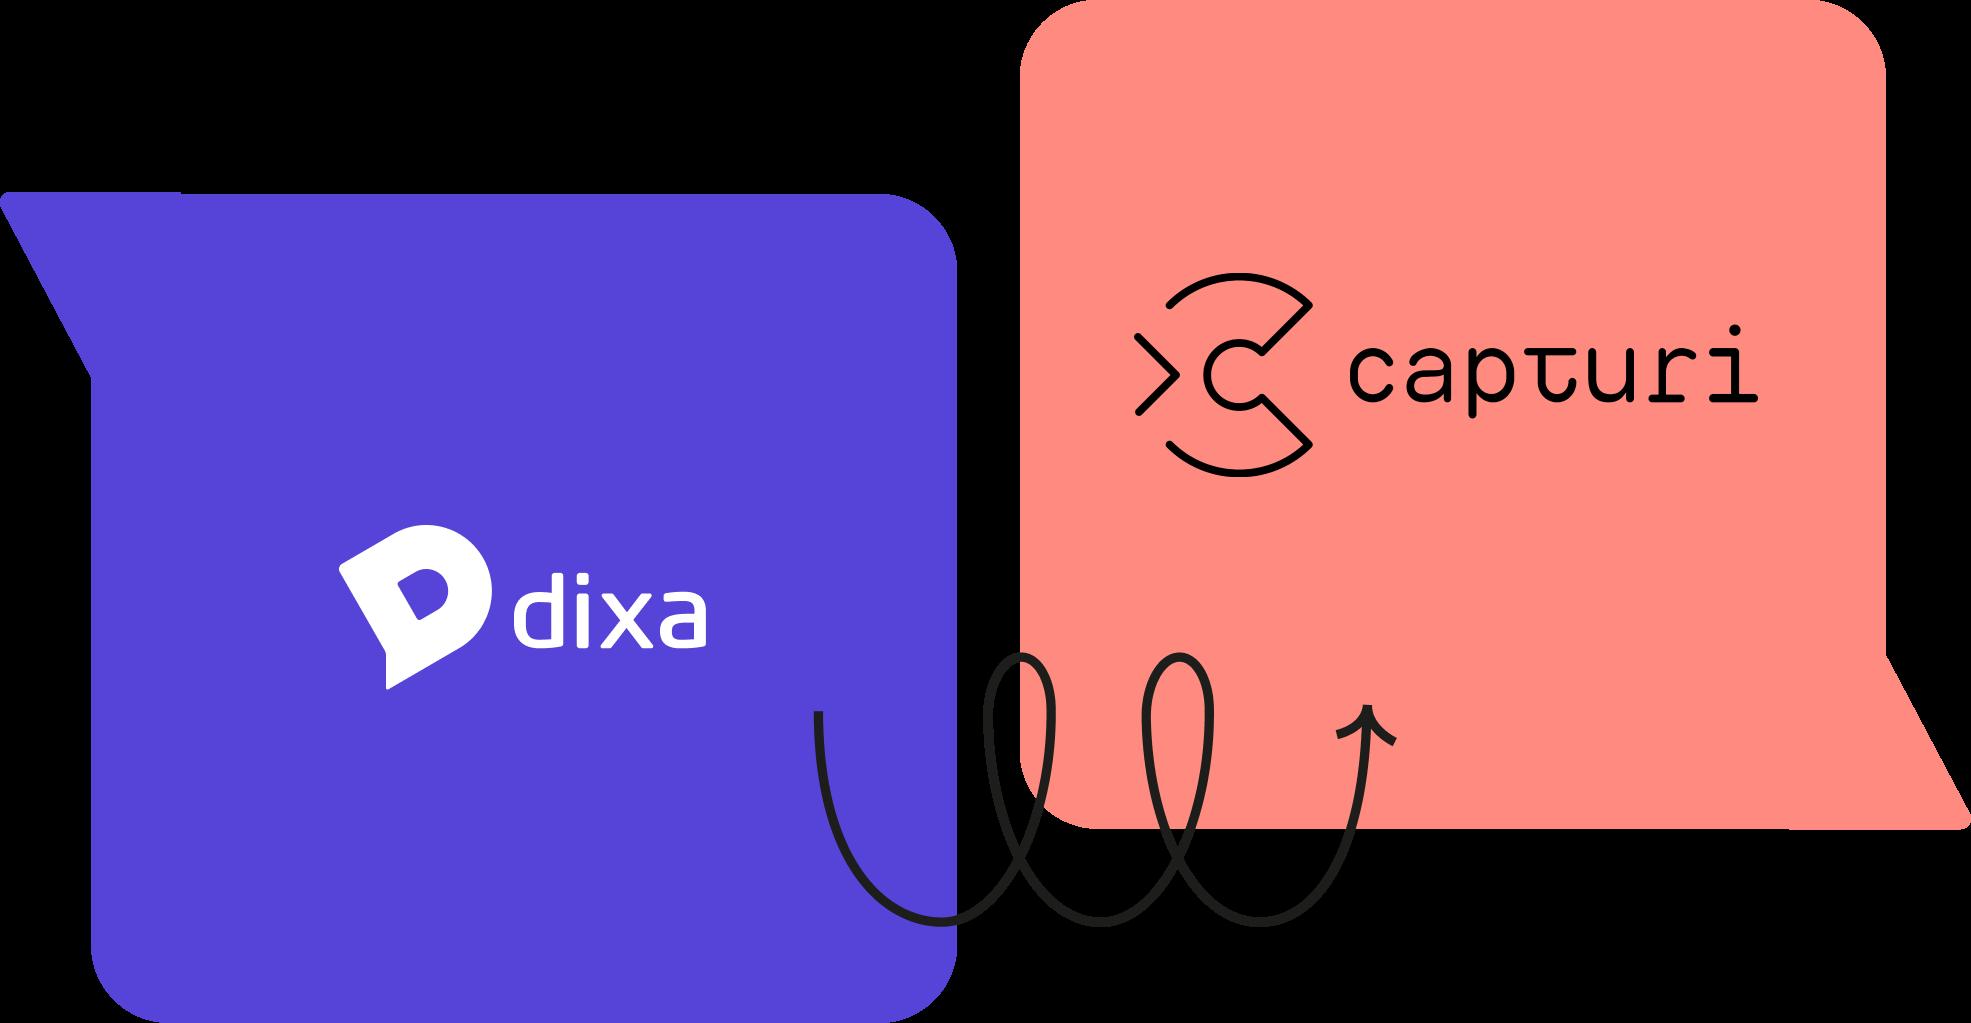 Capturi and Dixa